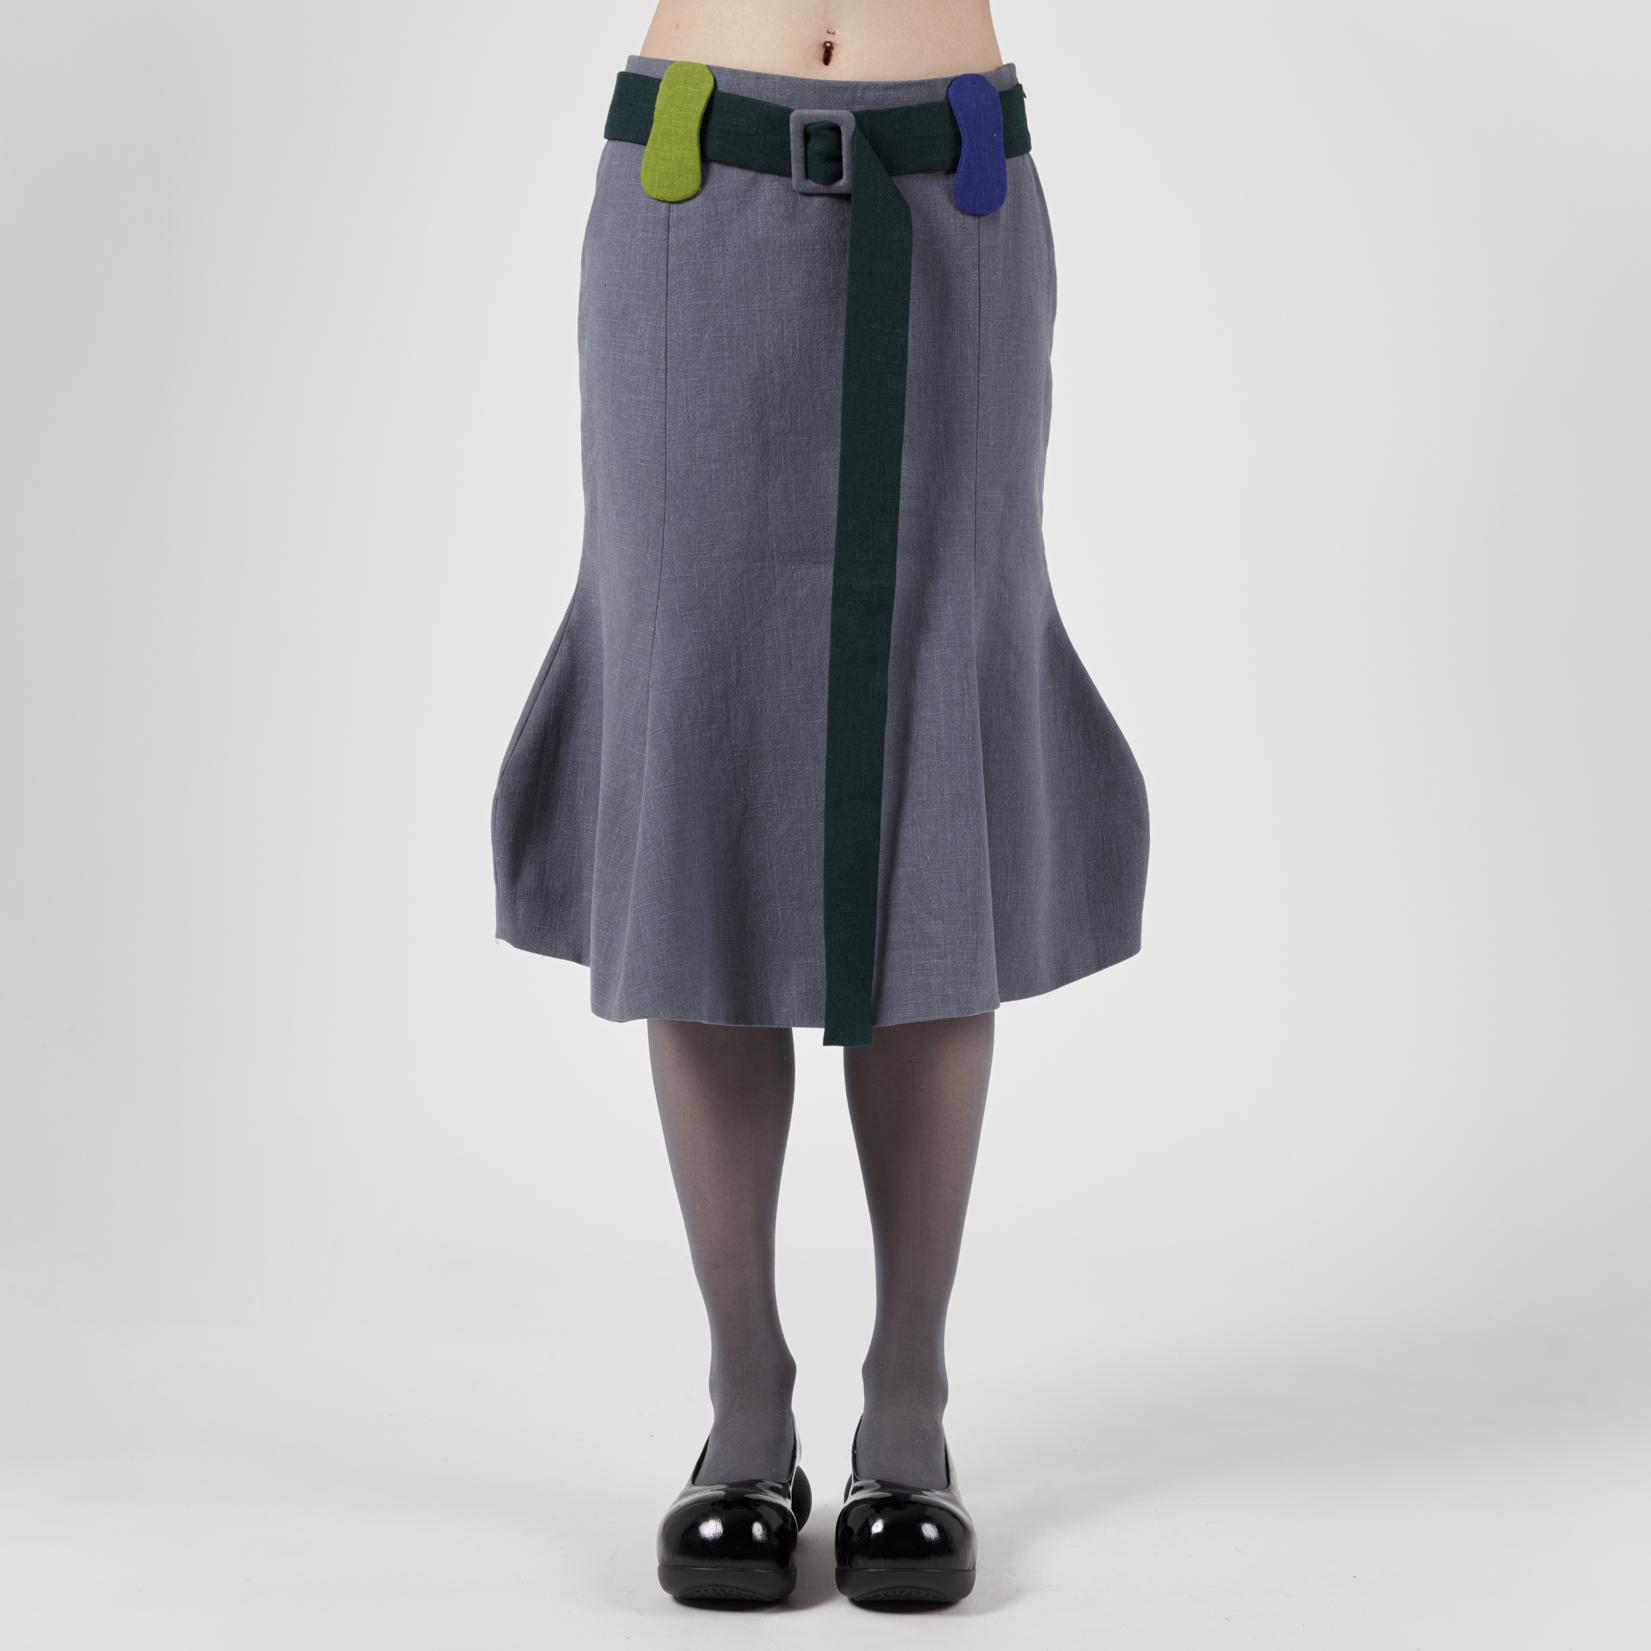 VeniceW Veggie Midi Skirt II